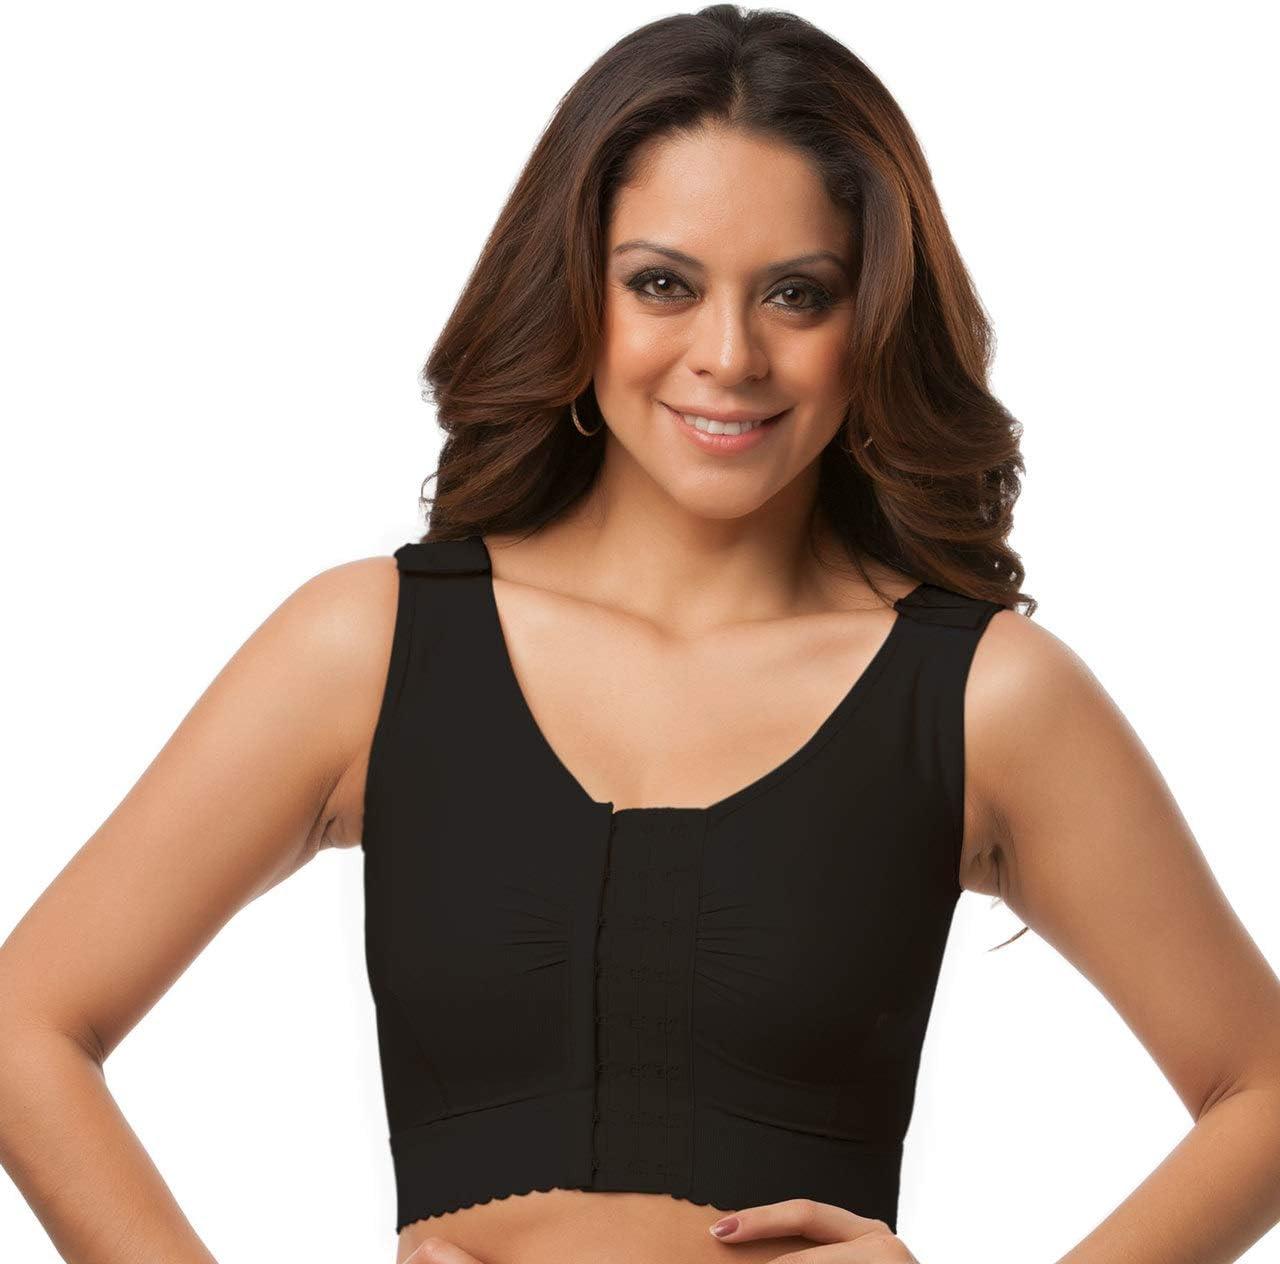 Isavela Womens Vest//Bra Center Hook /& Eye Without Sleeves/ XS Beige